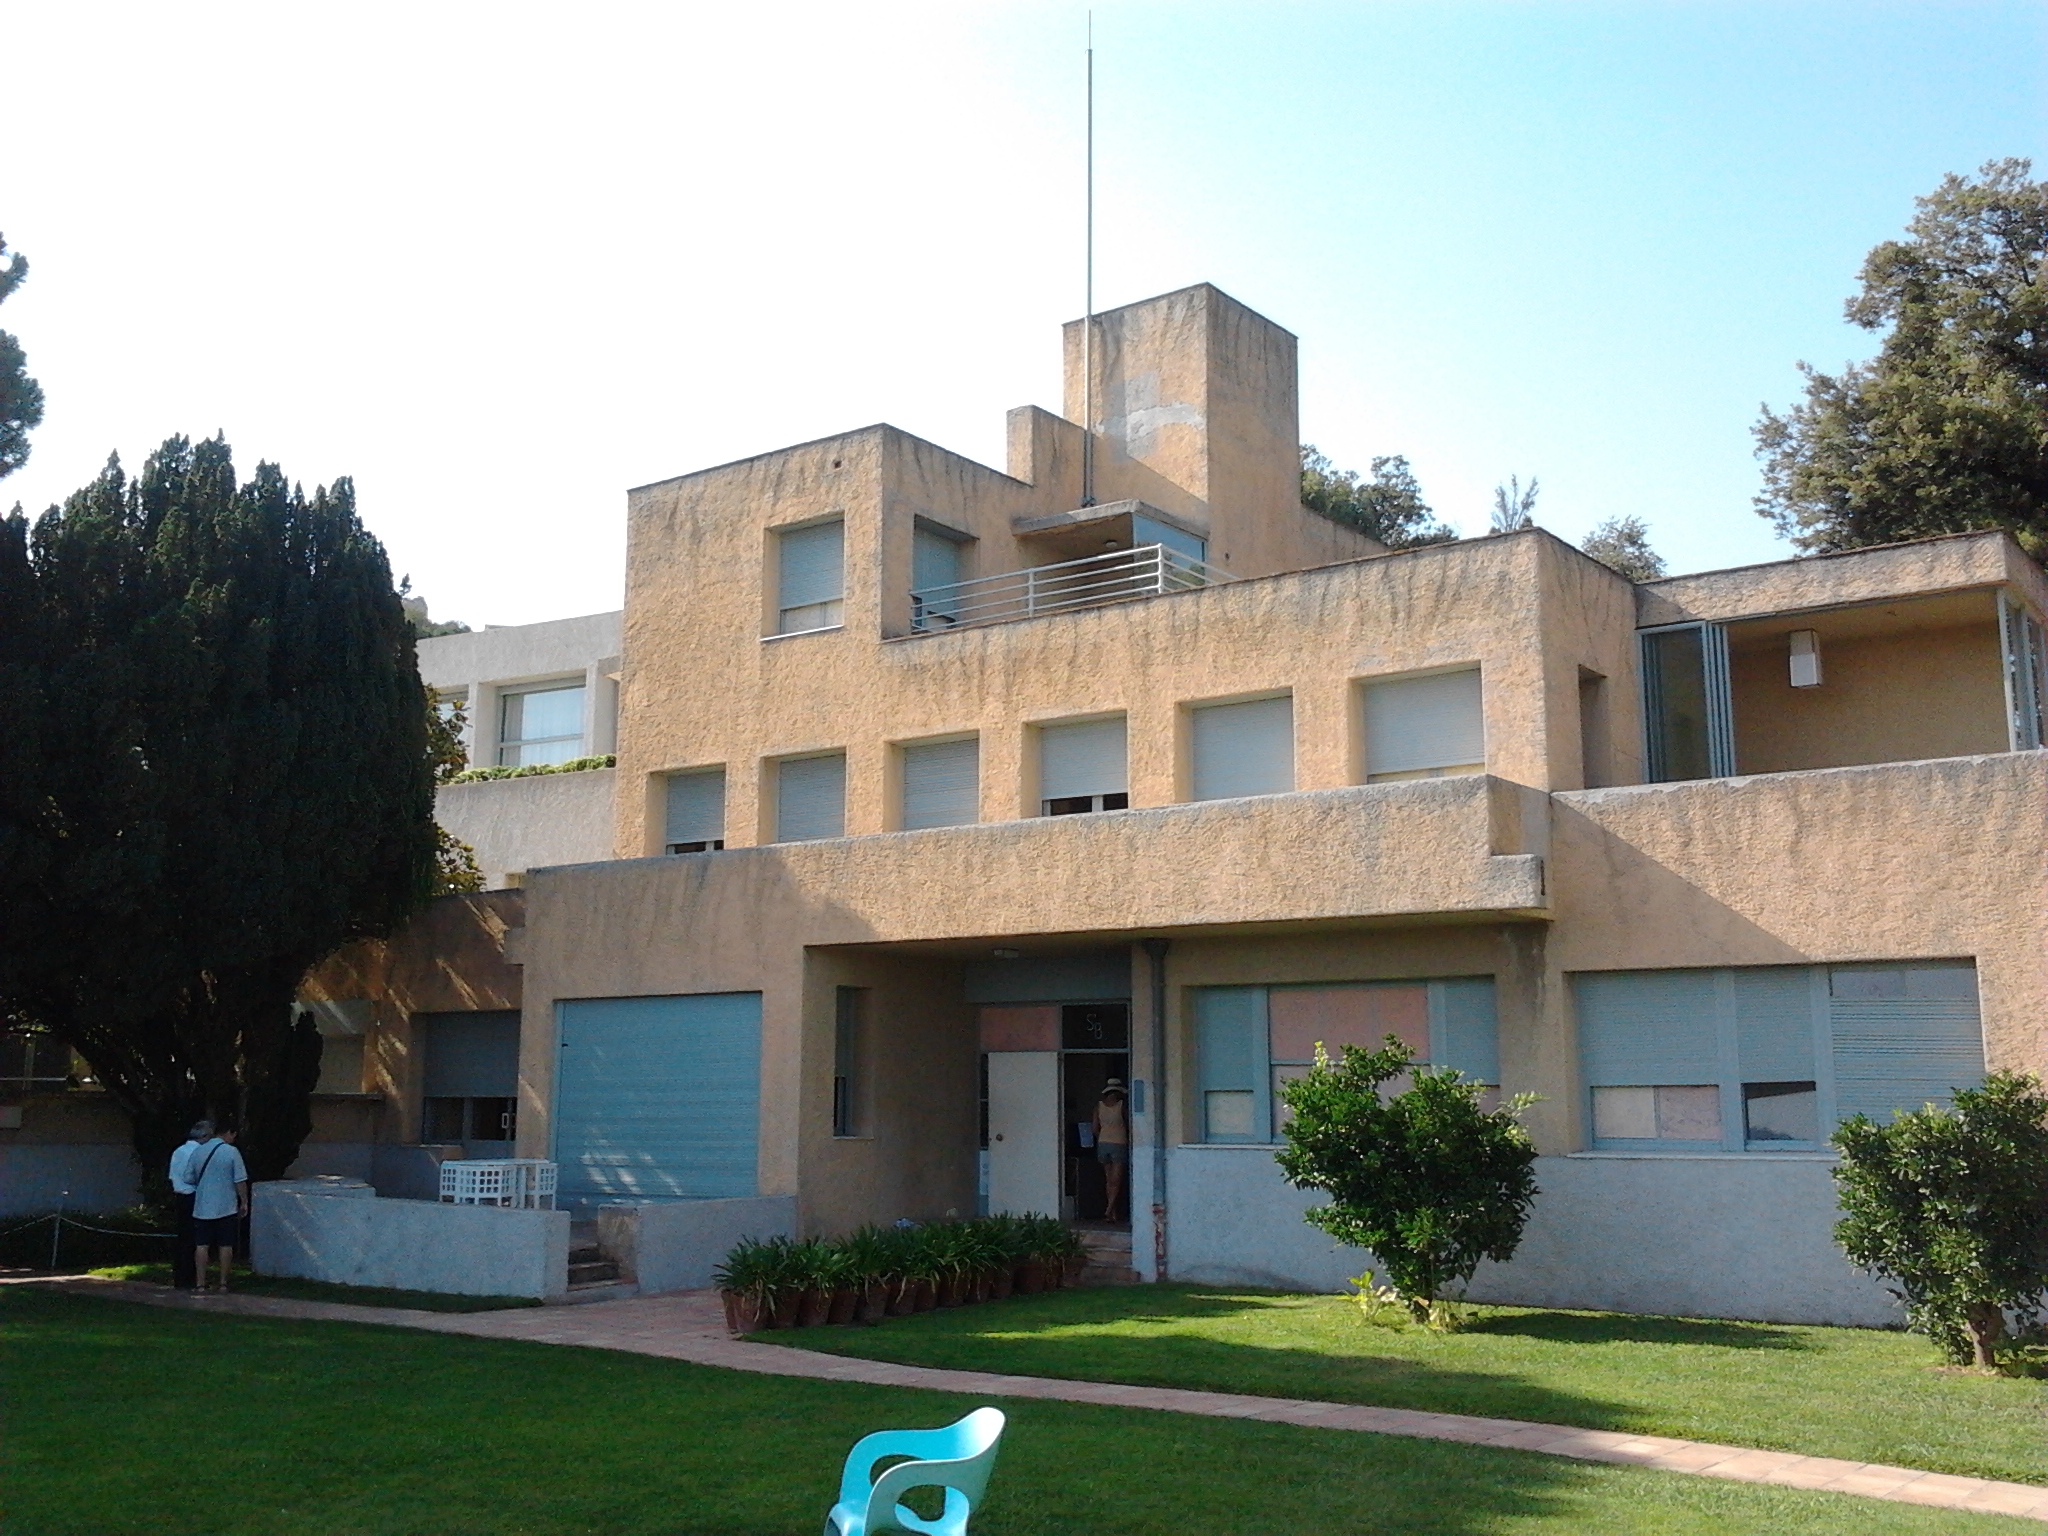 Villa Noailles – Wikipedia